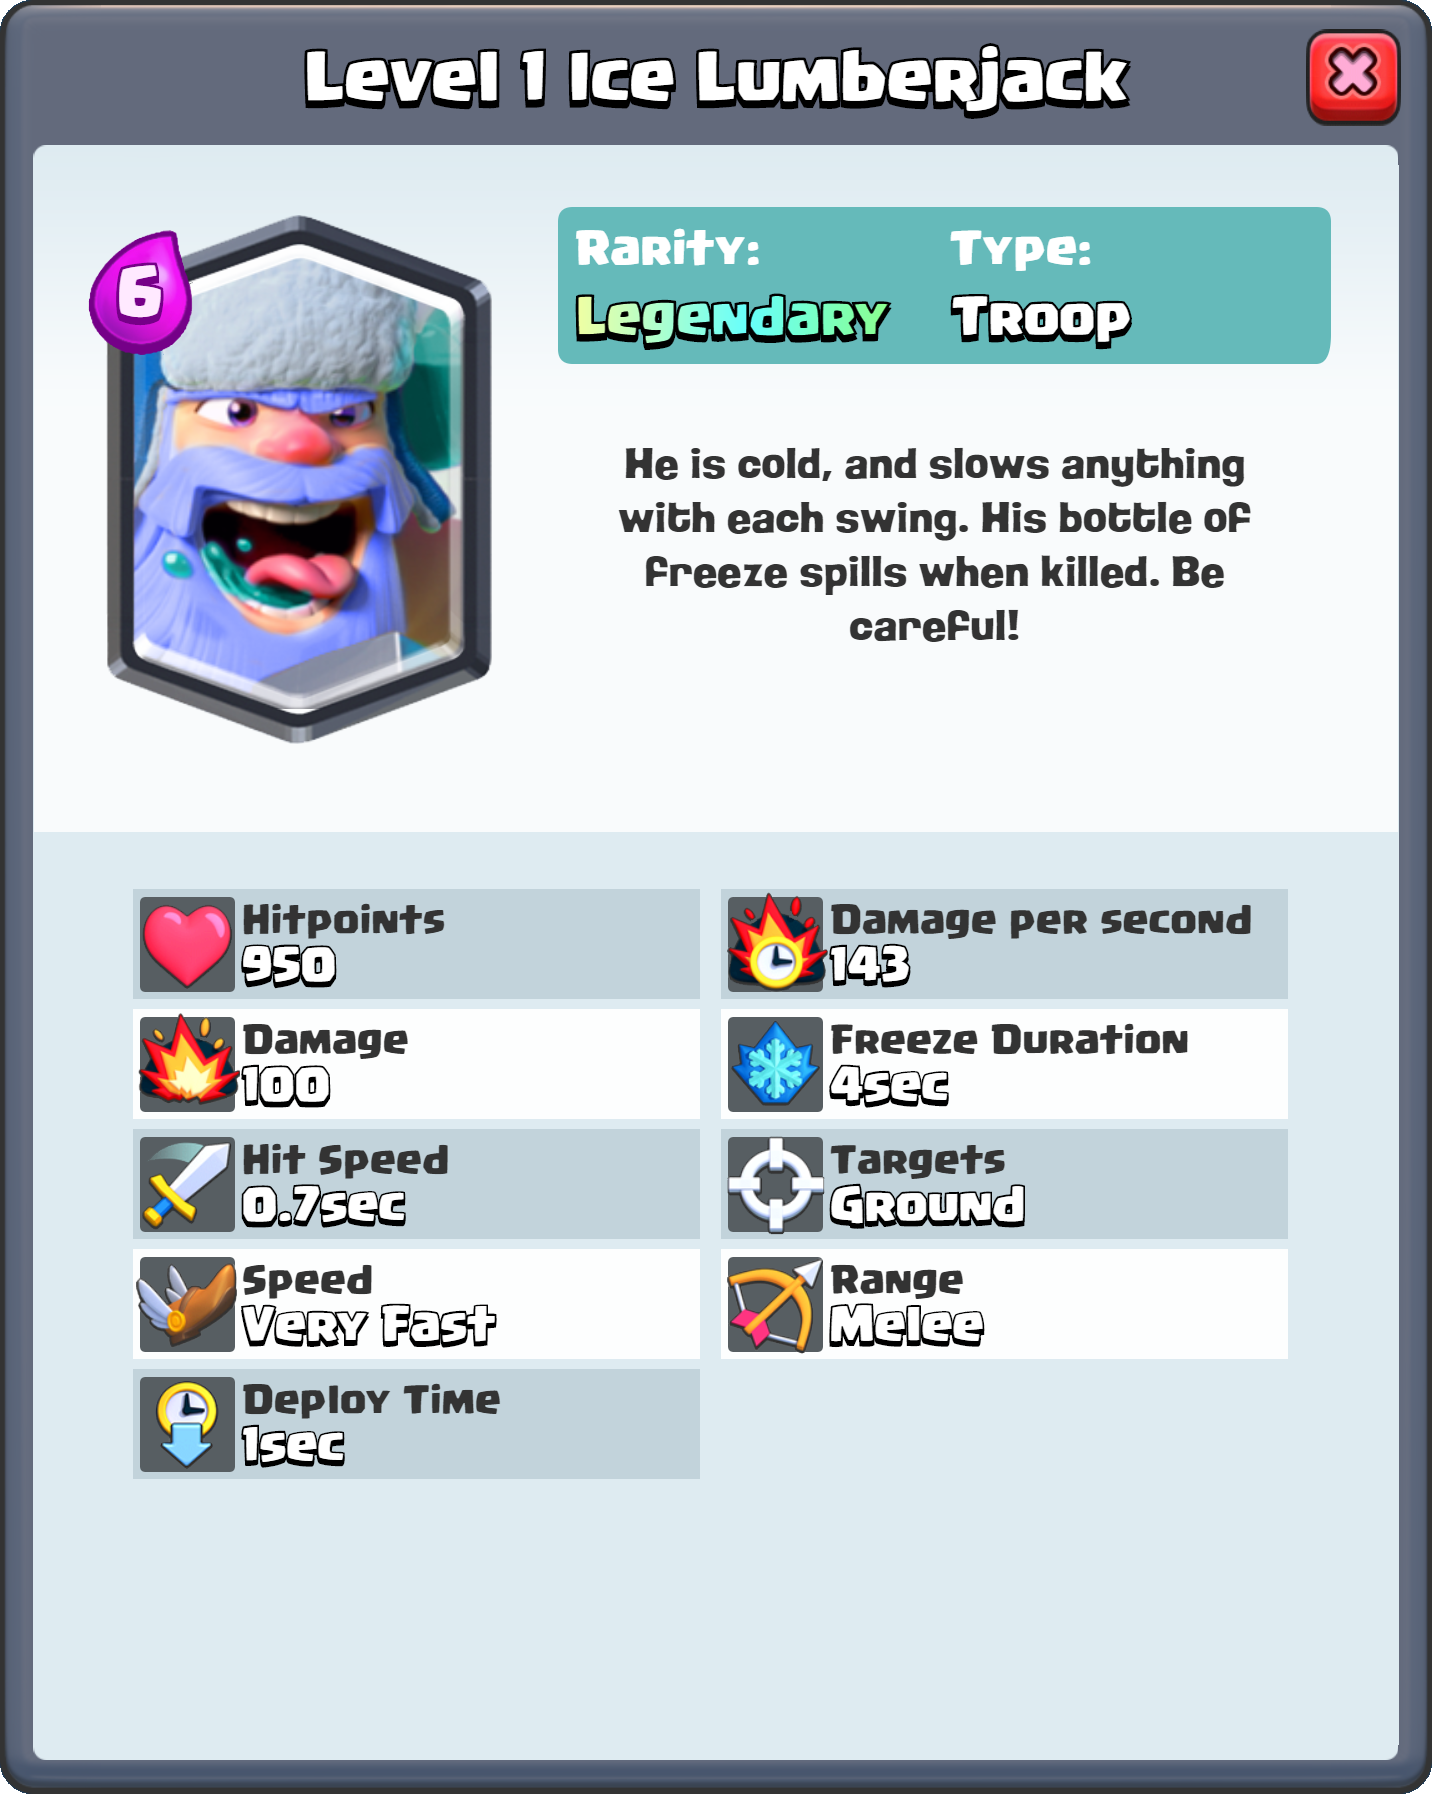 Image Level 1 Ice Lumberjack Fq Png Clash Royale Wiki